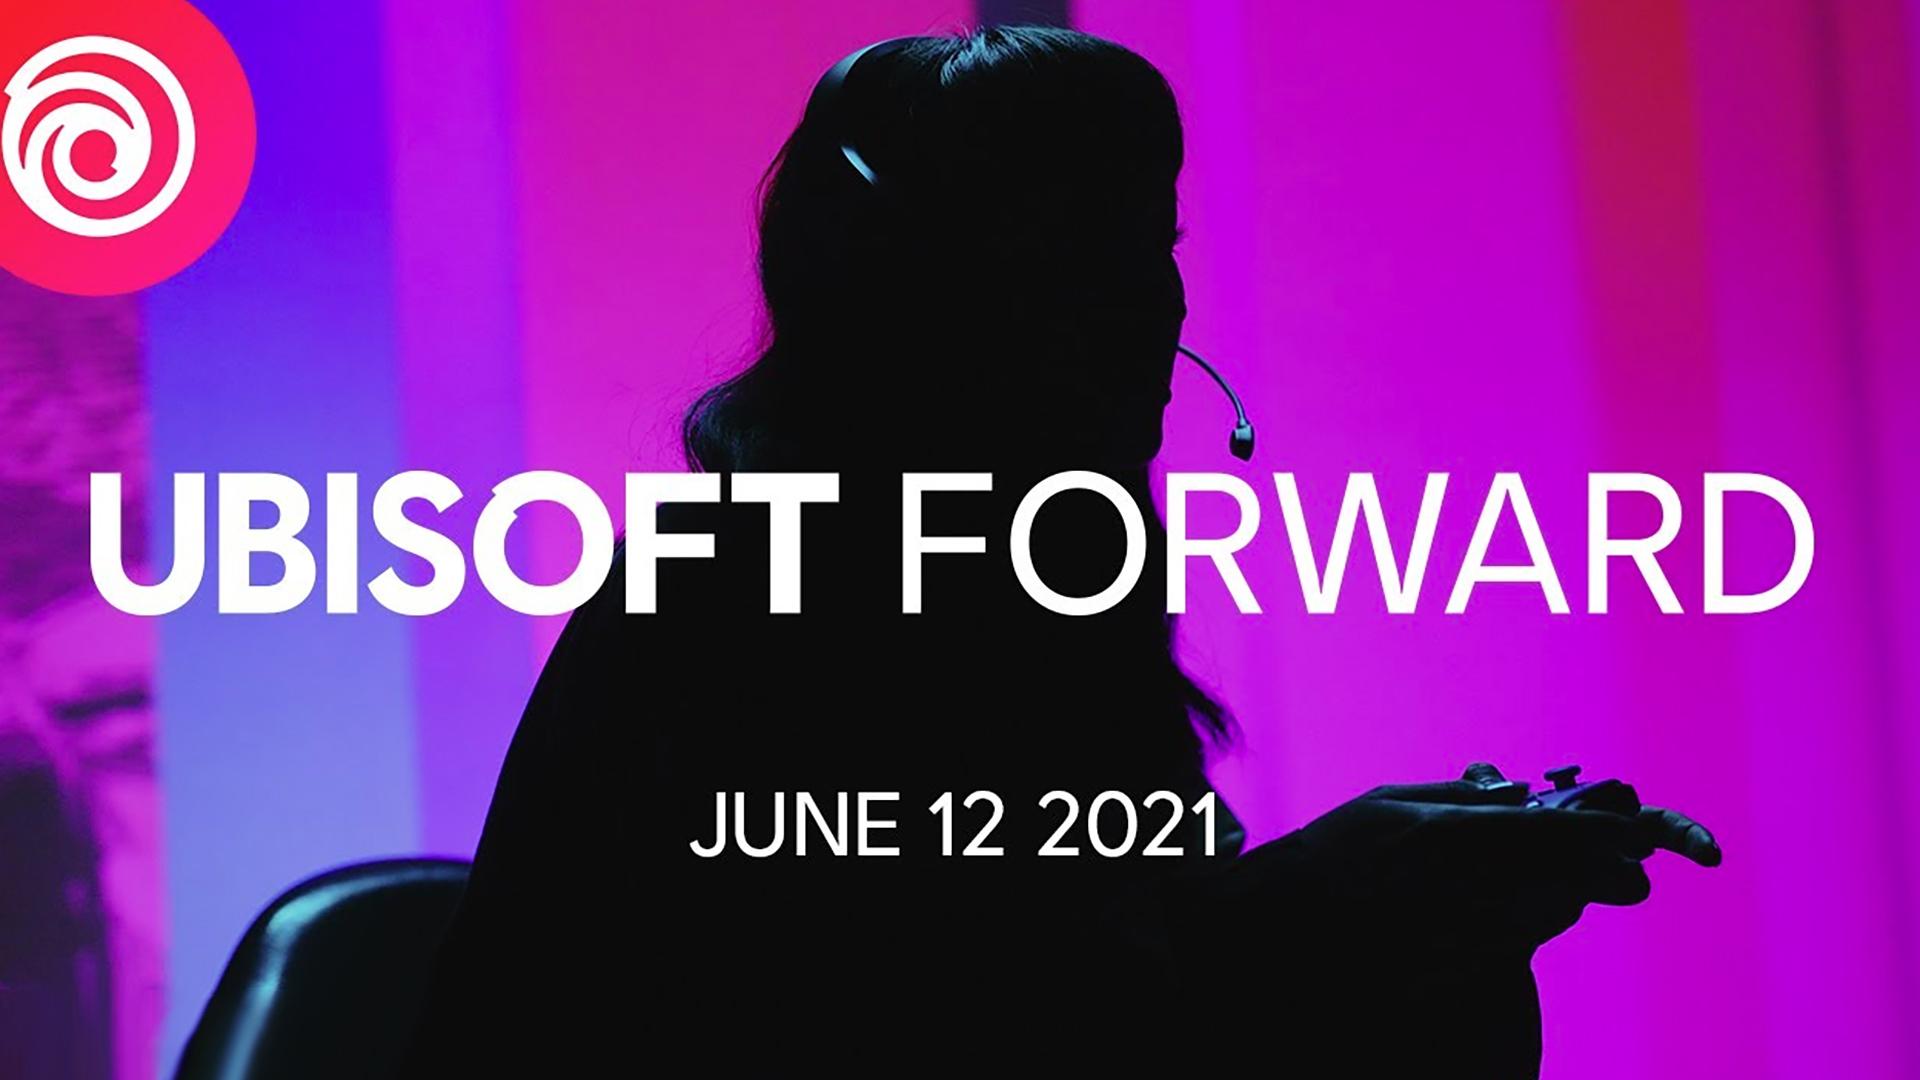 Ubisoft-Forward-E3-2021-Preshow-Teaser